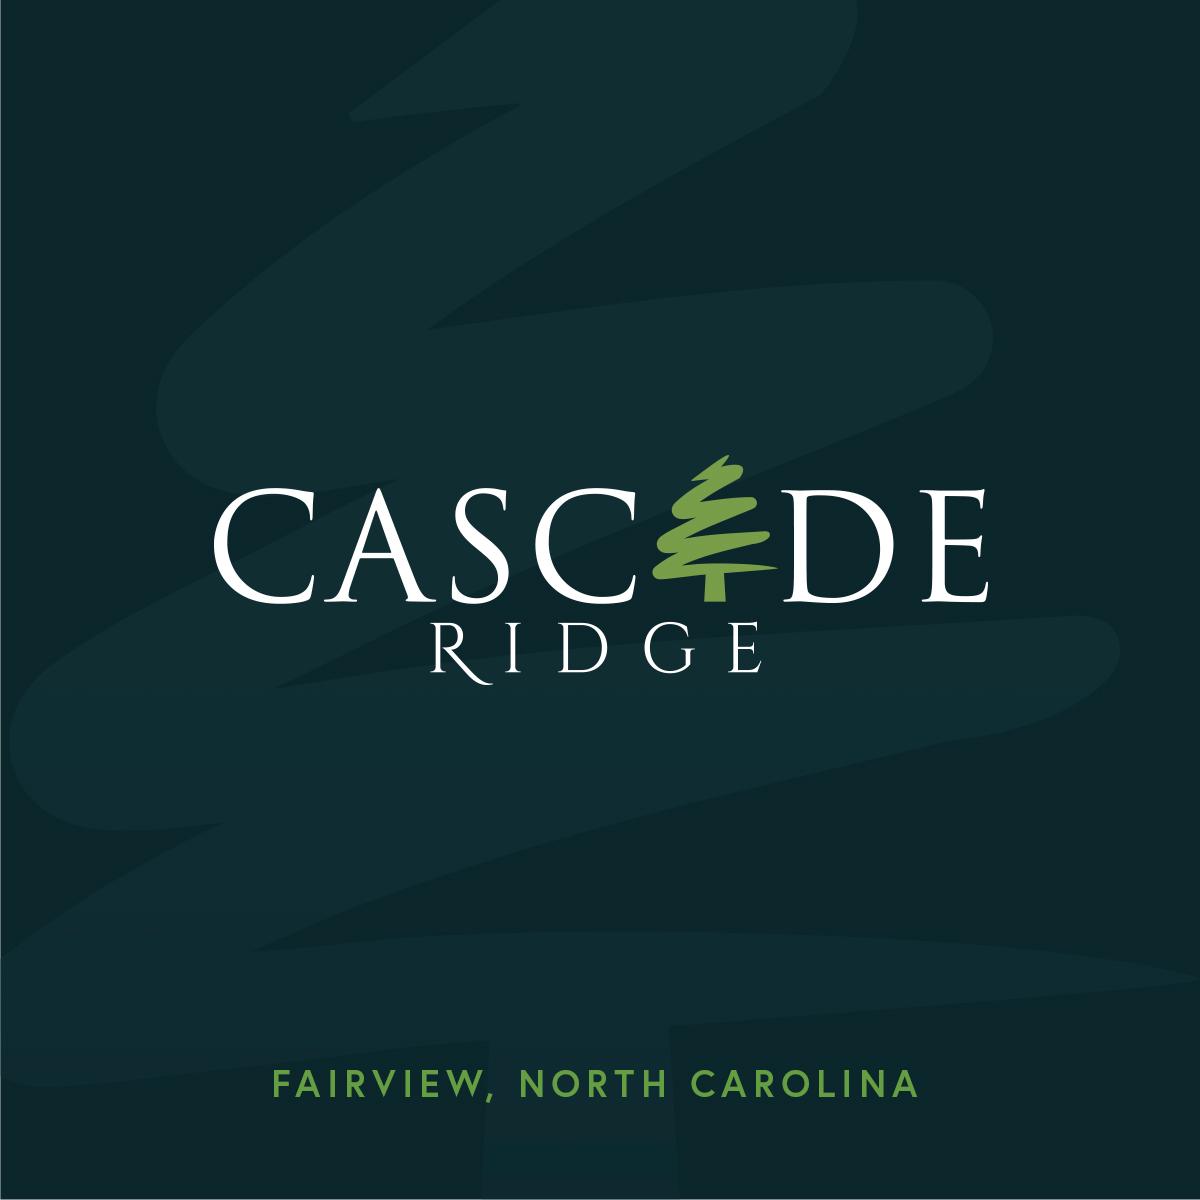 Cascade Ridge